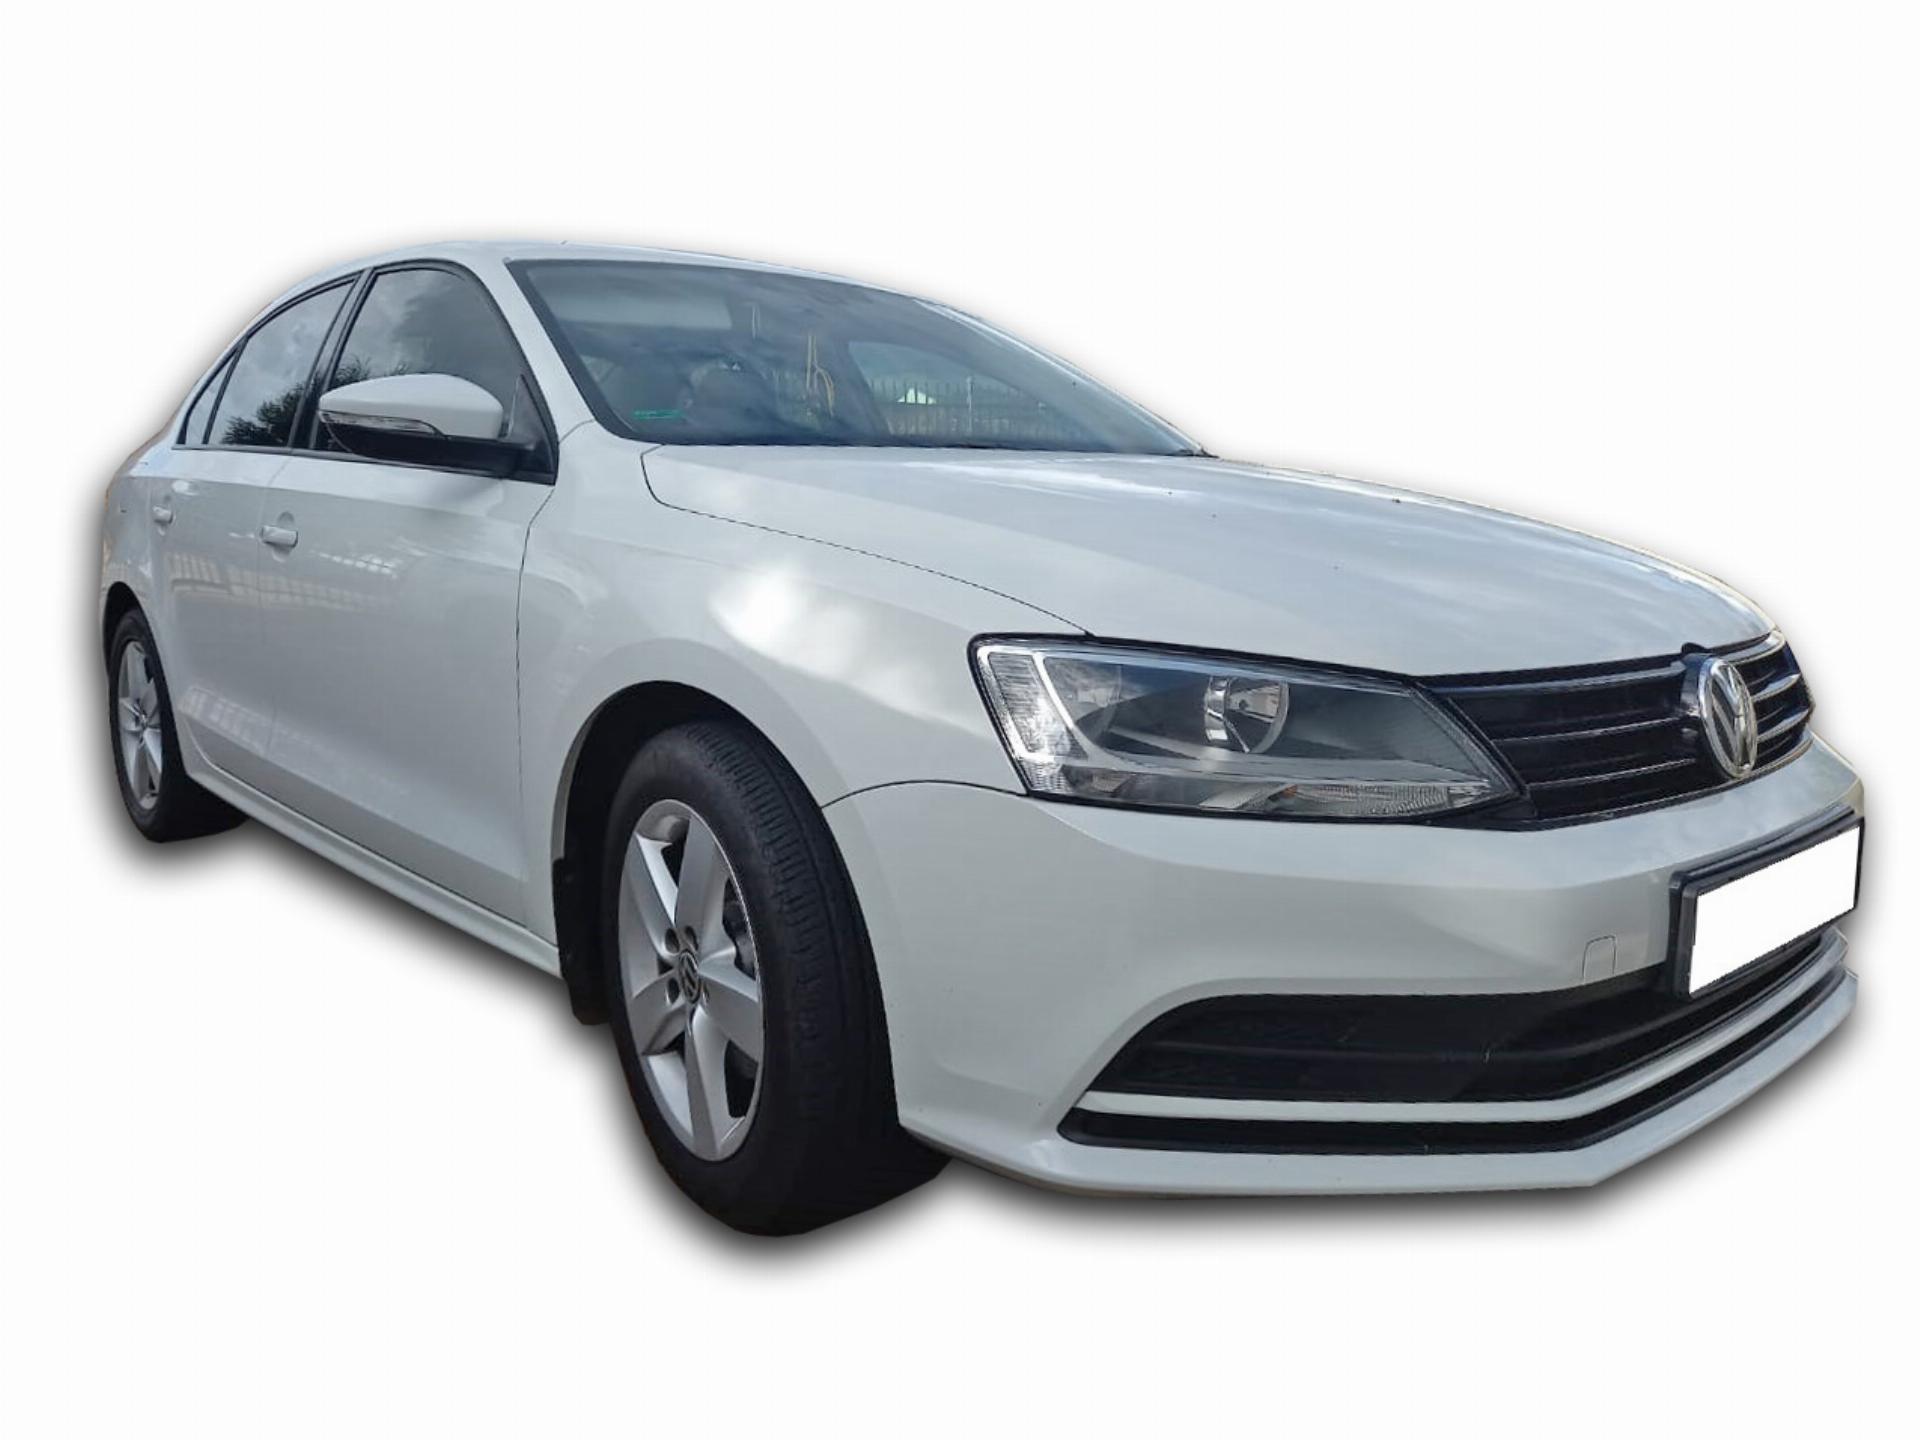 Volkswagen Jetta 6 1.2 Tsi Trend